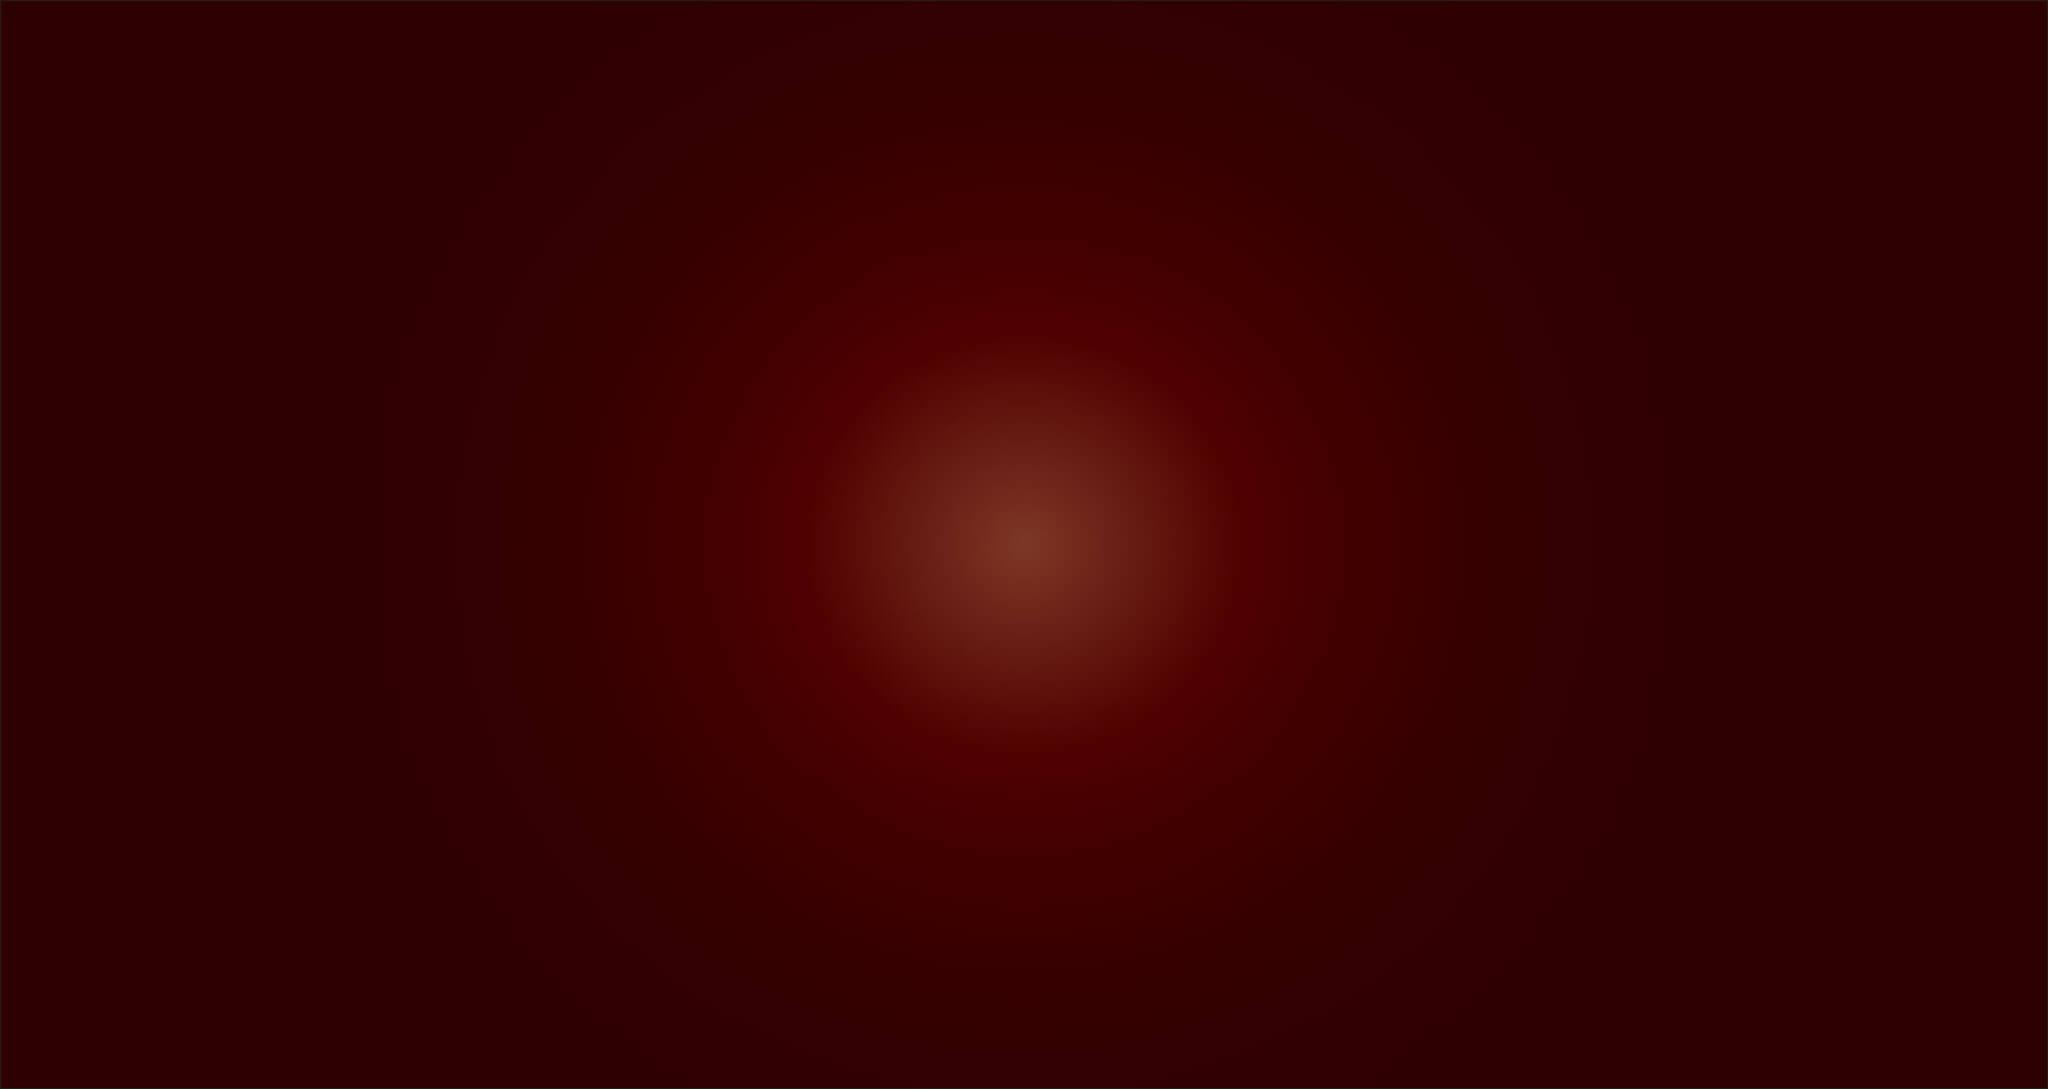 10mfh-background-red.jpg